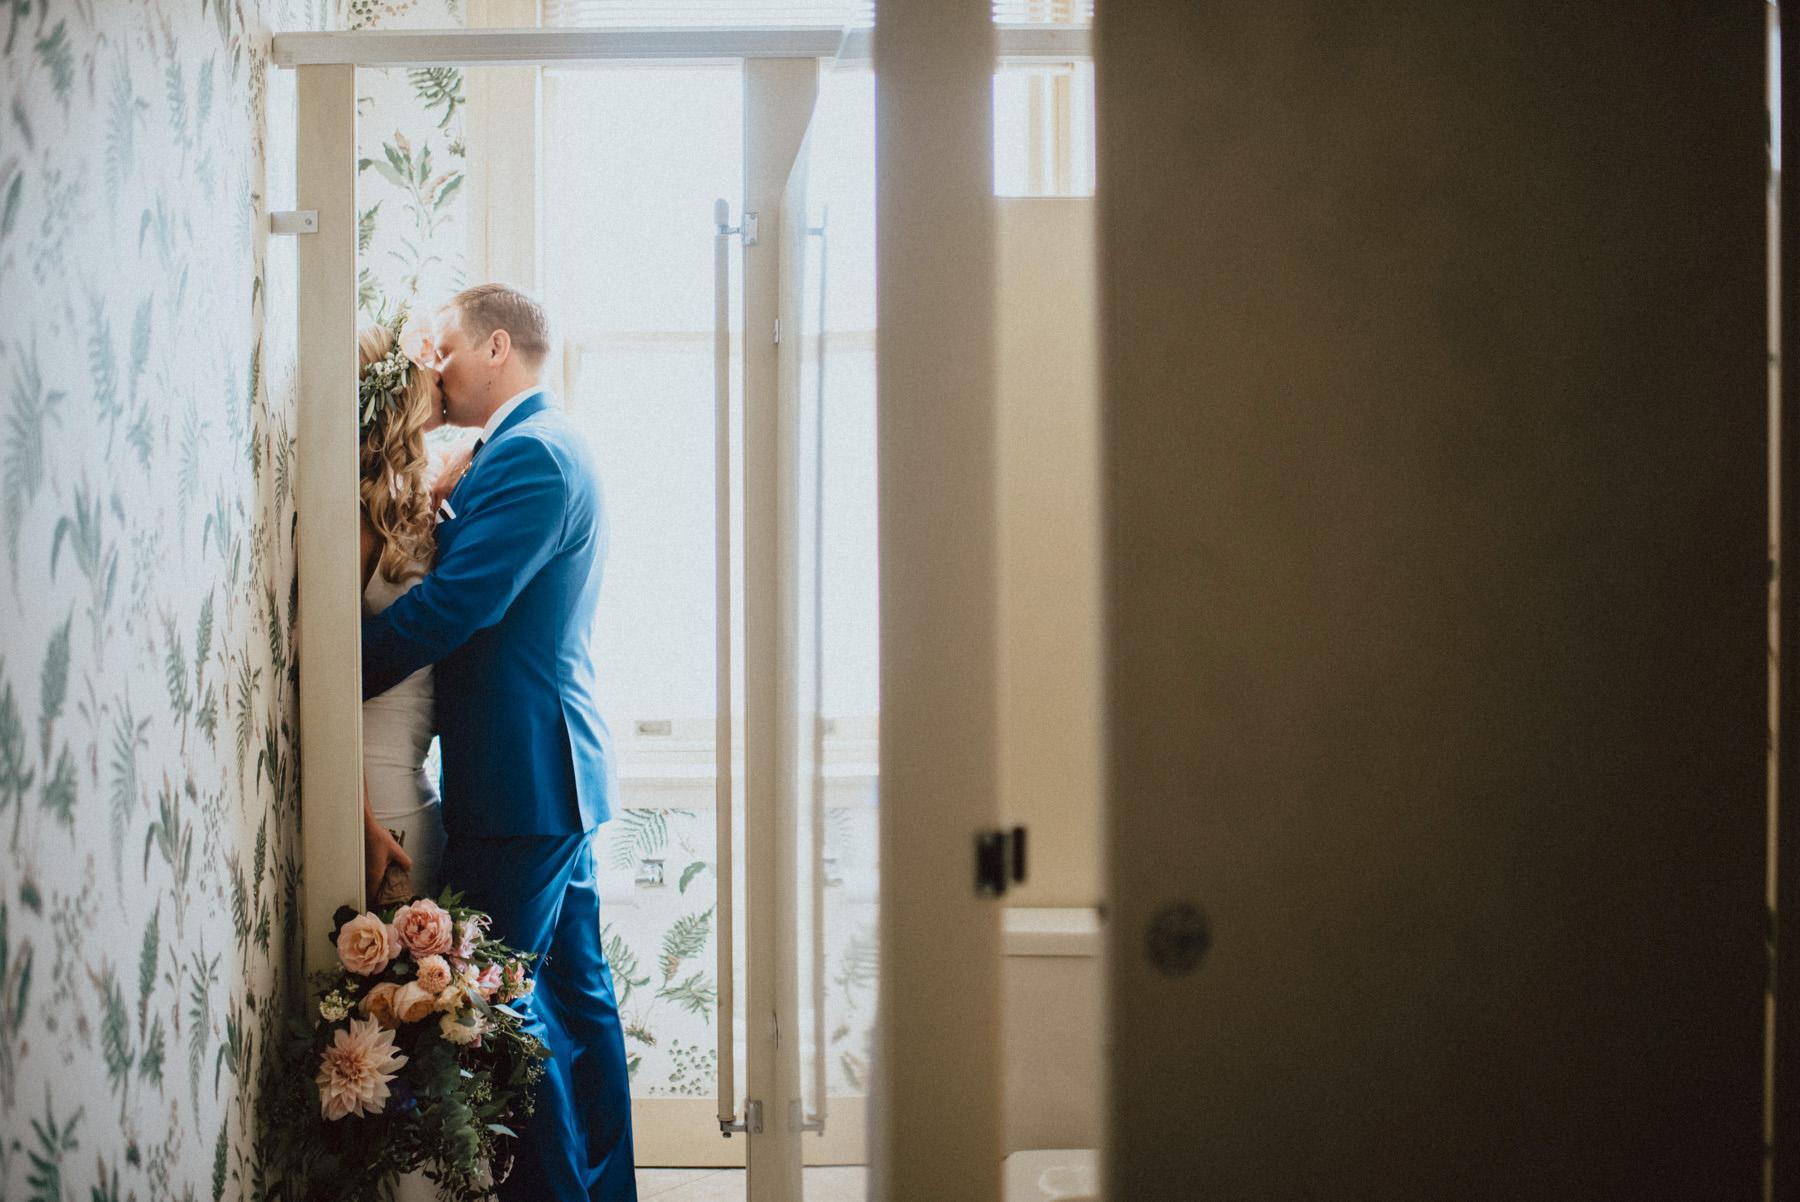 094-la-cherie-philly-wedding-8.jpg